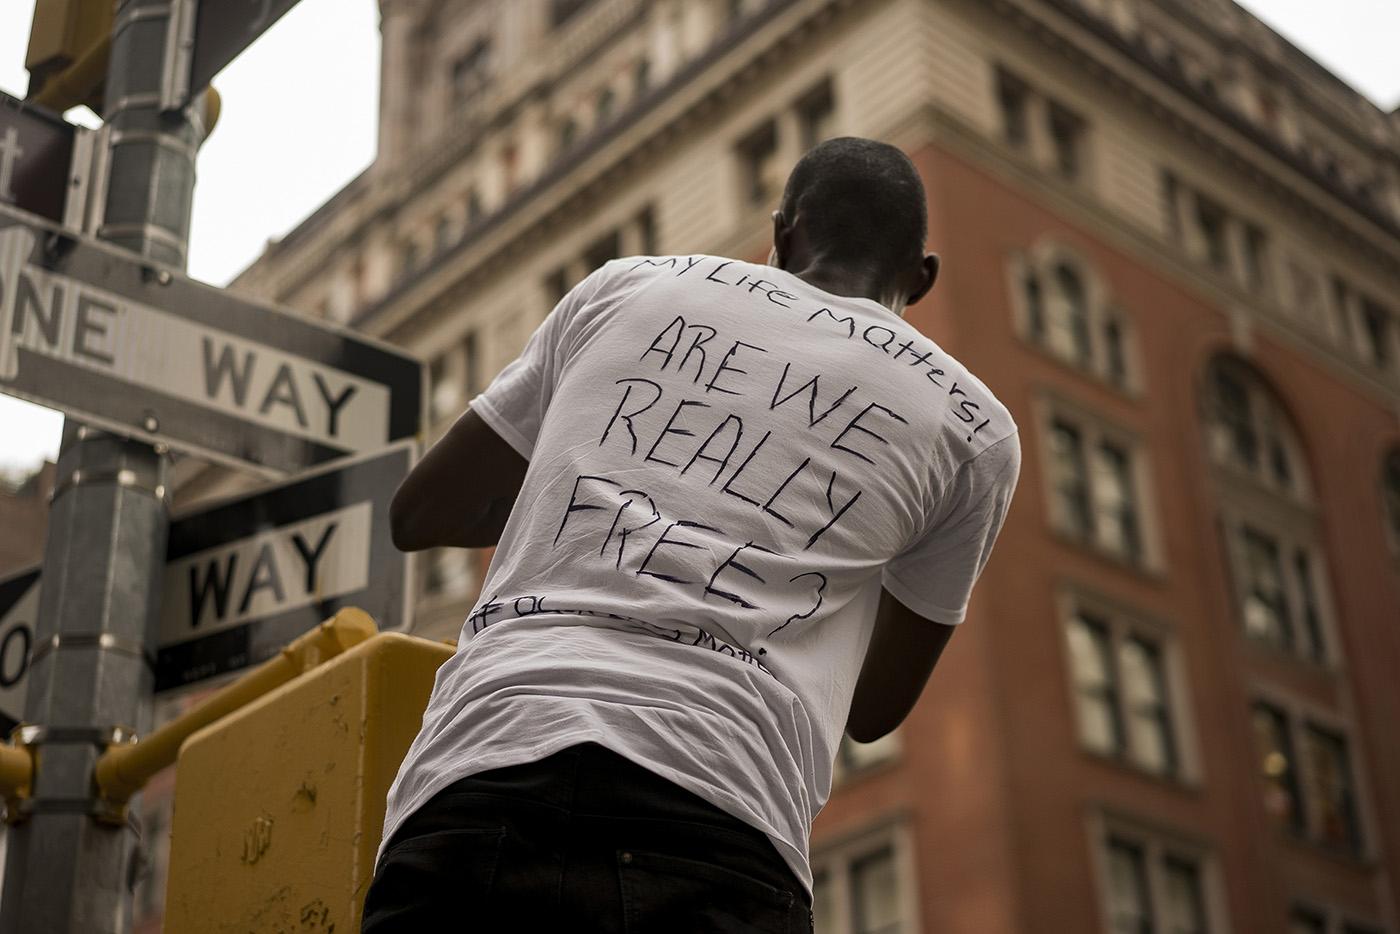 H_ARE_WE_FREE_NYC_2016.jpg